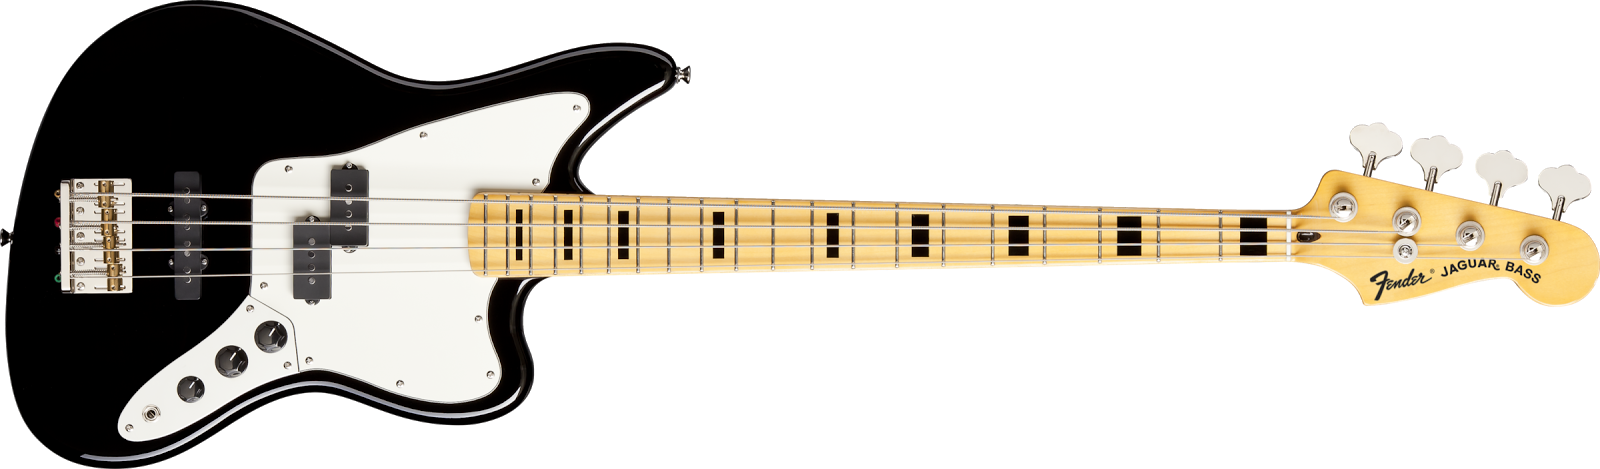 theguitaraddict fender american standard jaguar bass. Black Bedroom Furniture Sets. Home Design Ideas